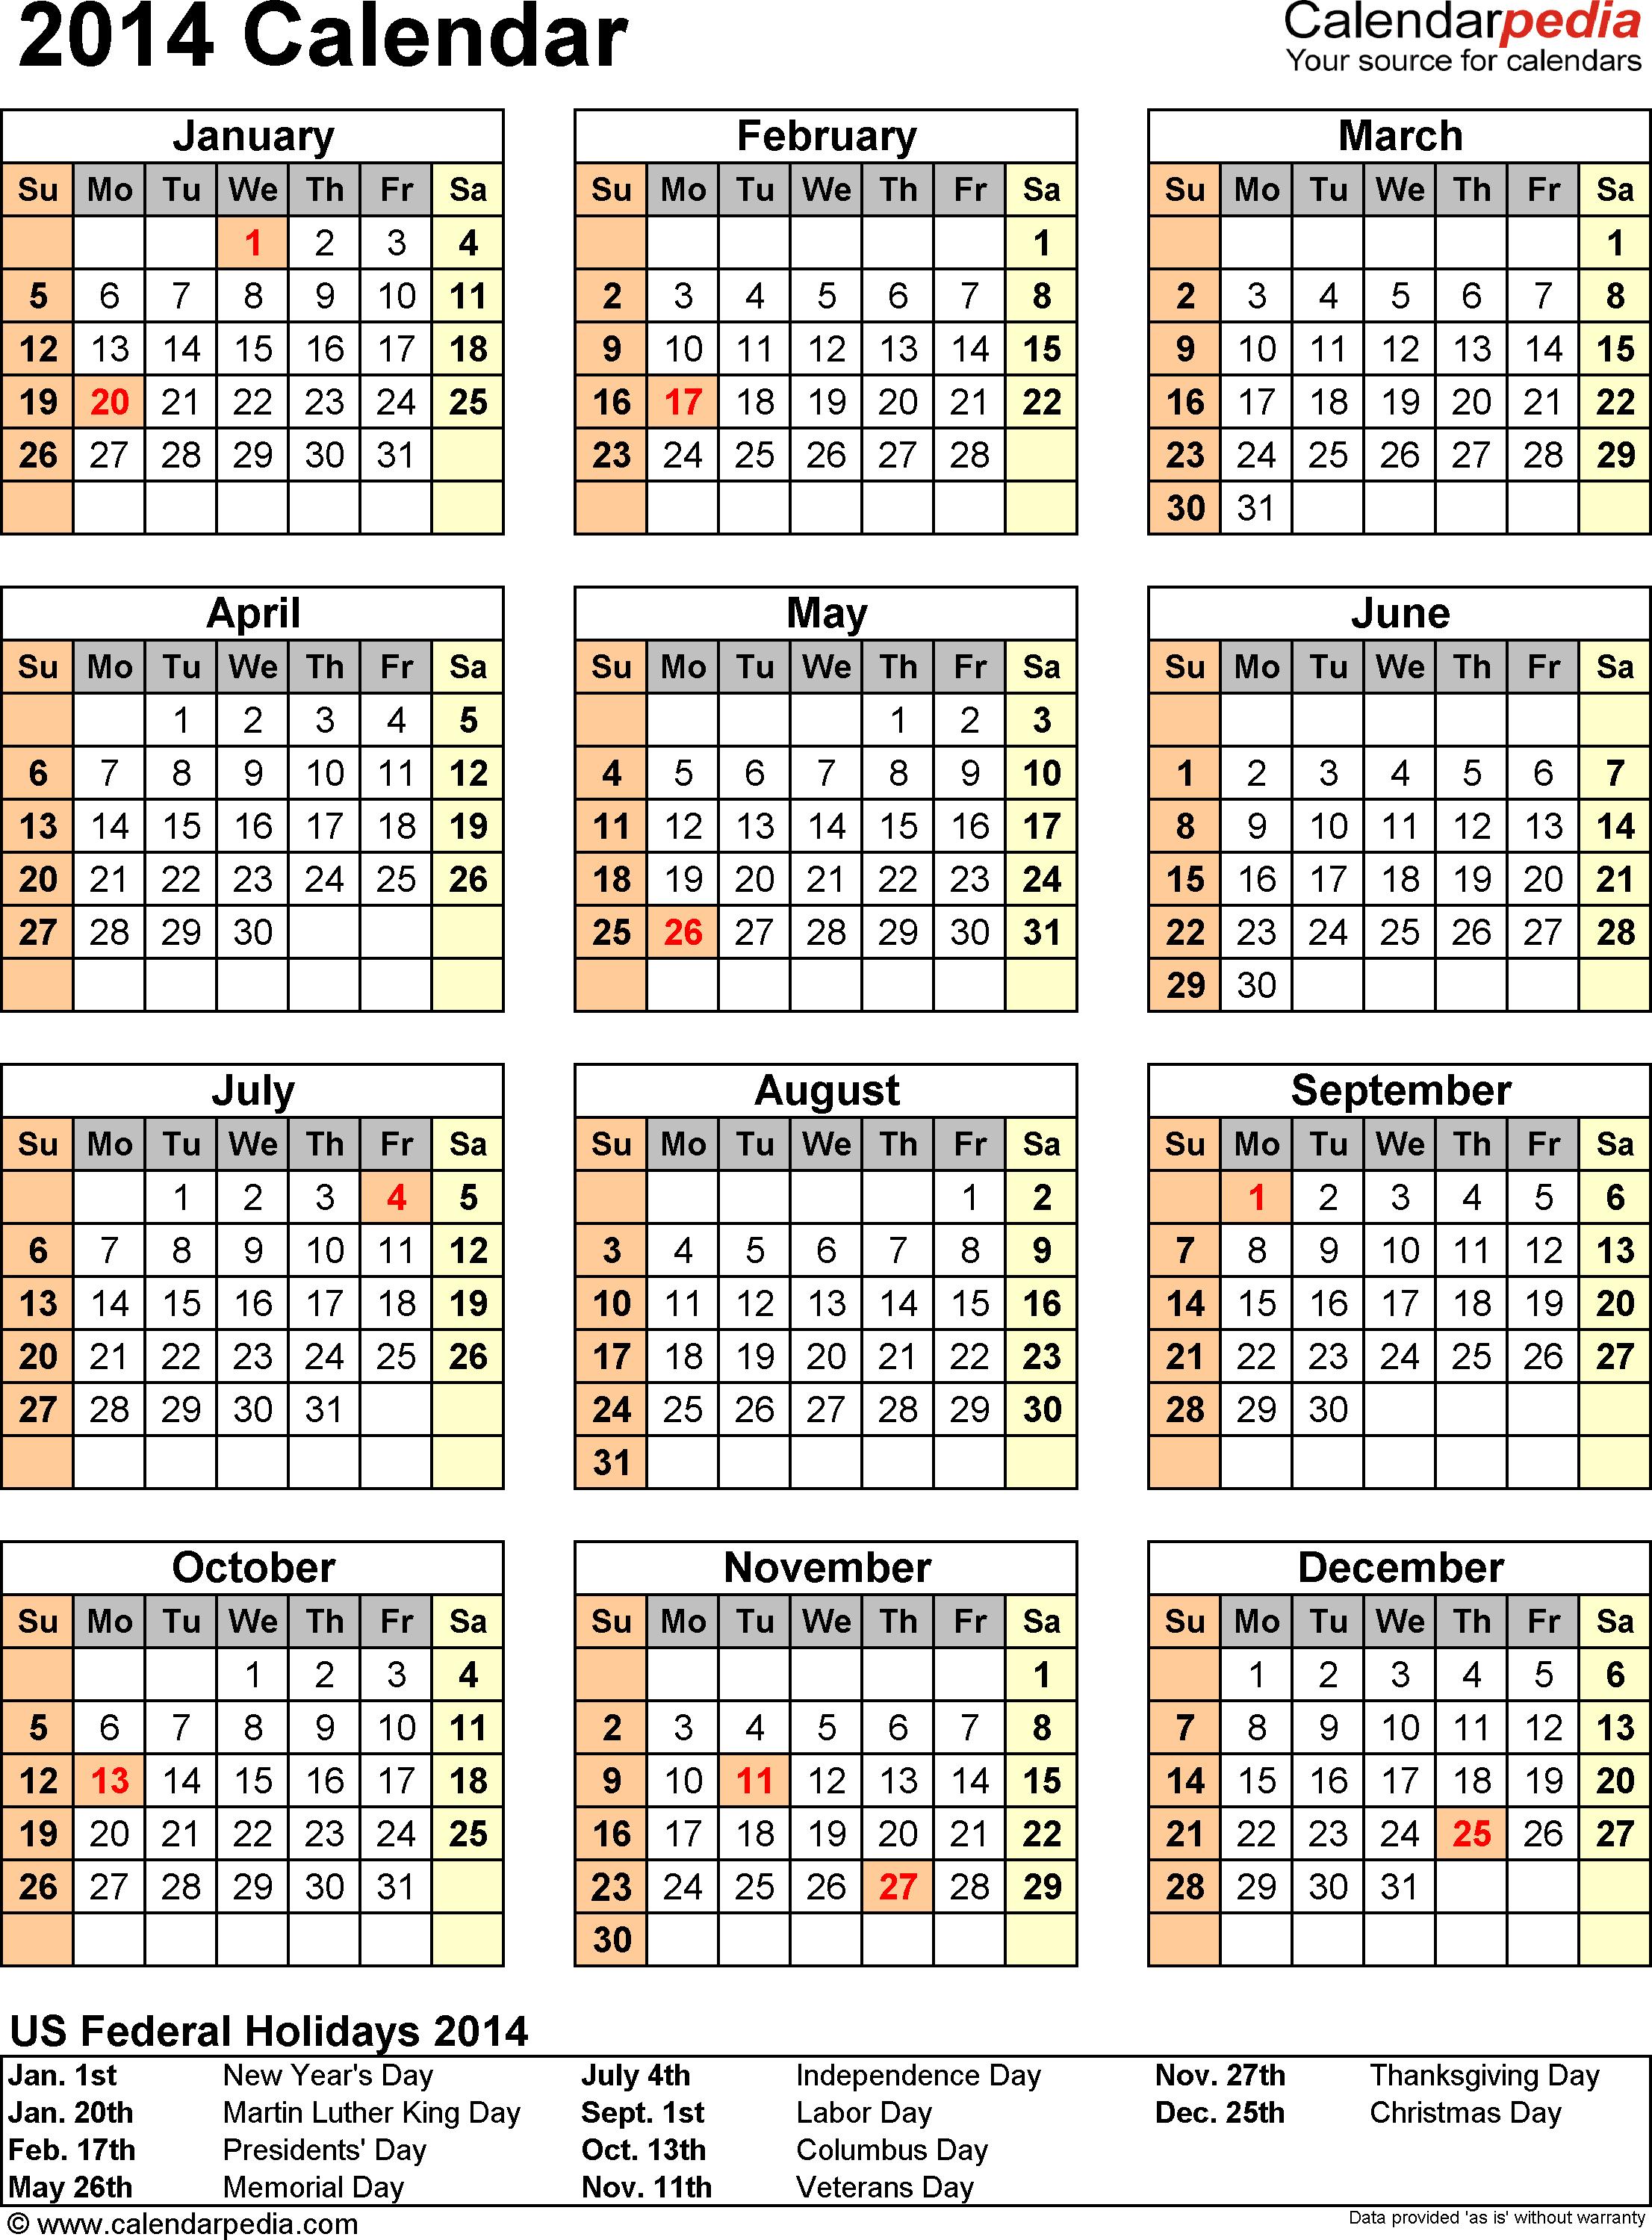 Download Template 13: 2014 Calendar for Excel, portrait, 1 page